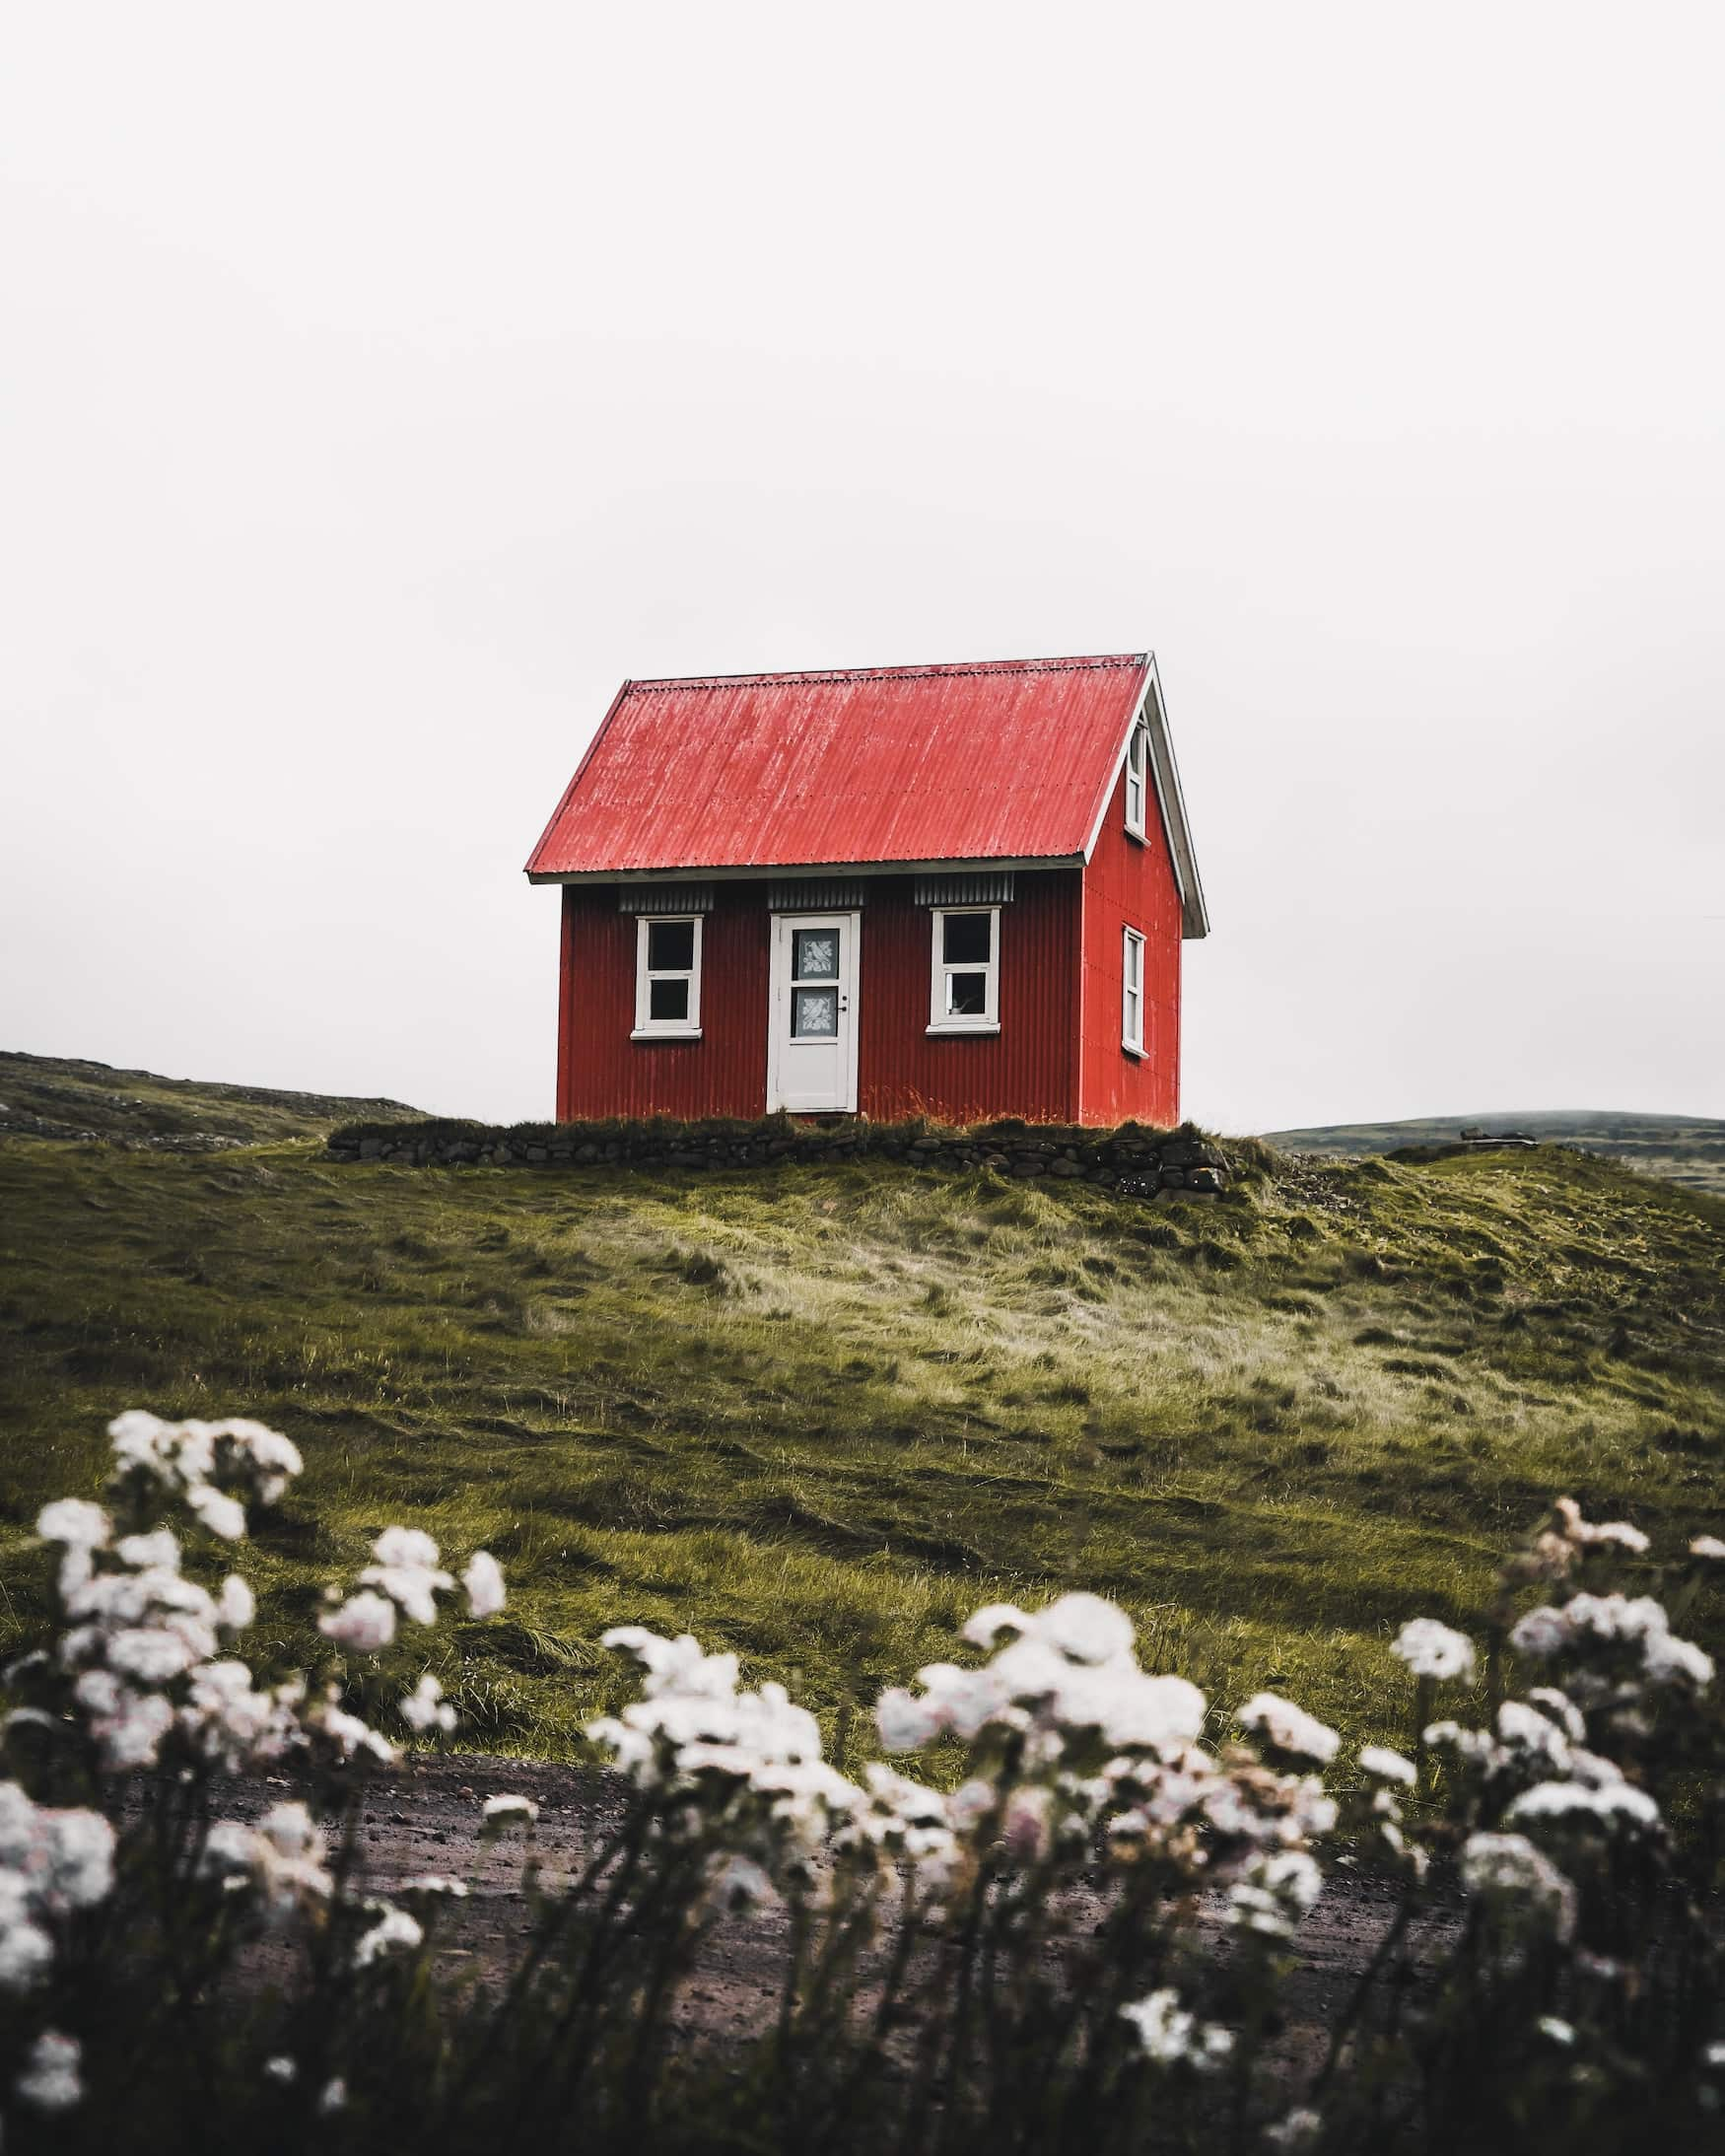 Rotes Haus in verlassener isländischer Landschaft